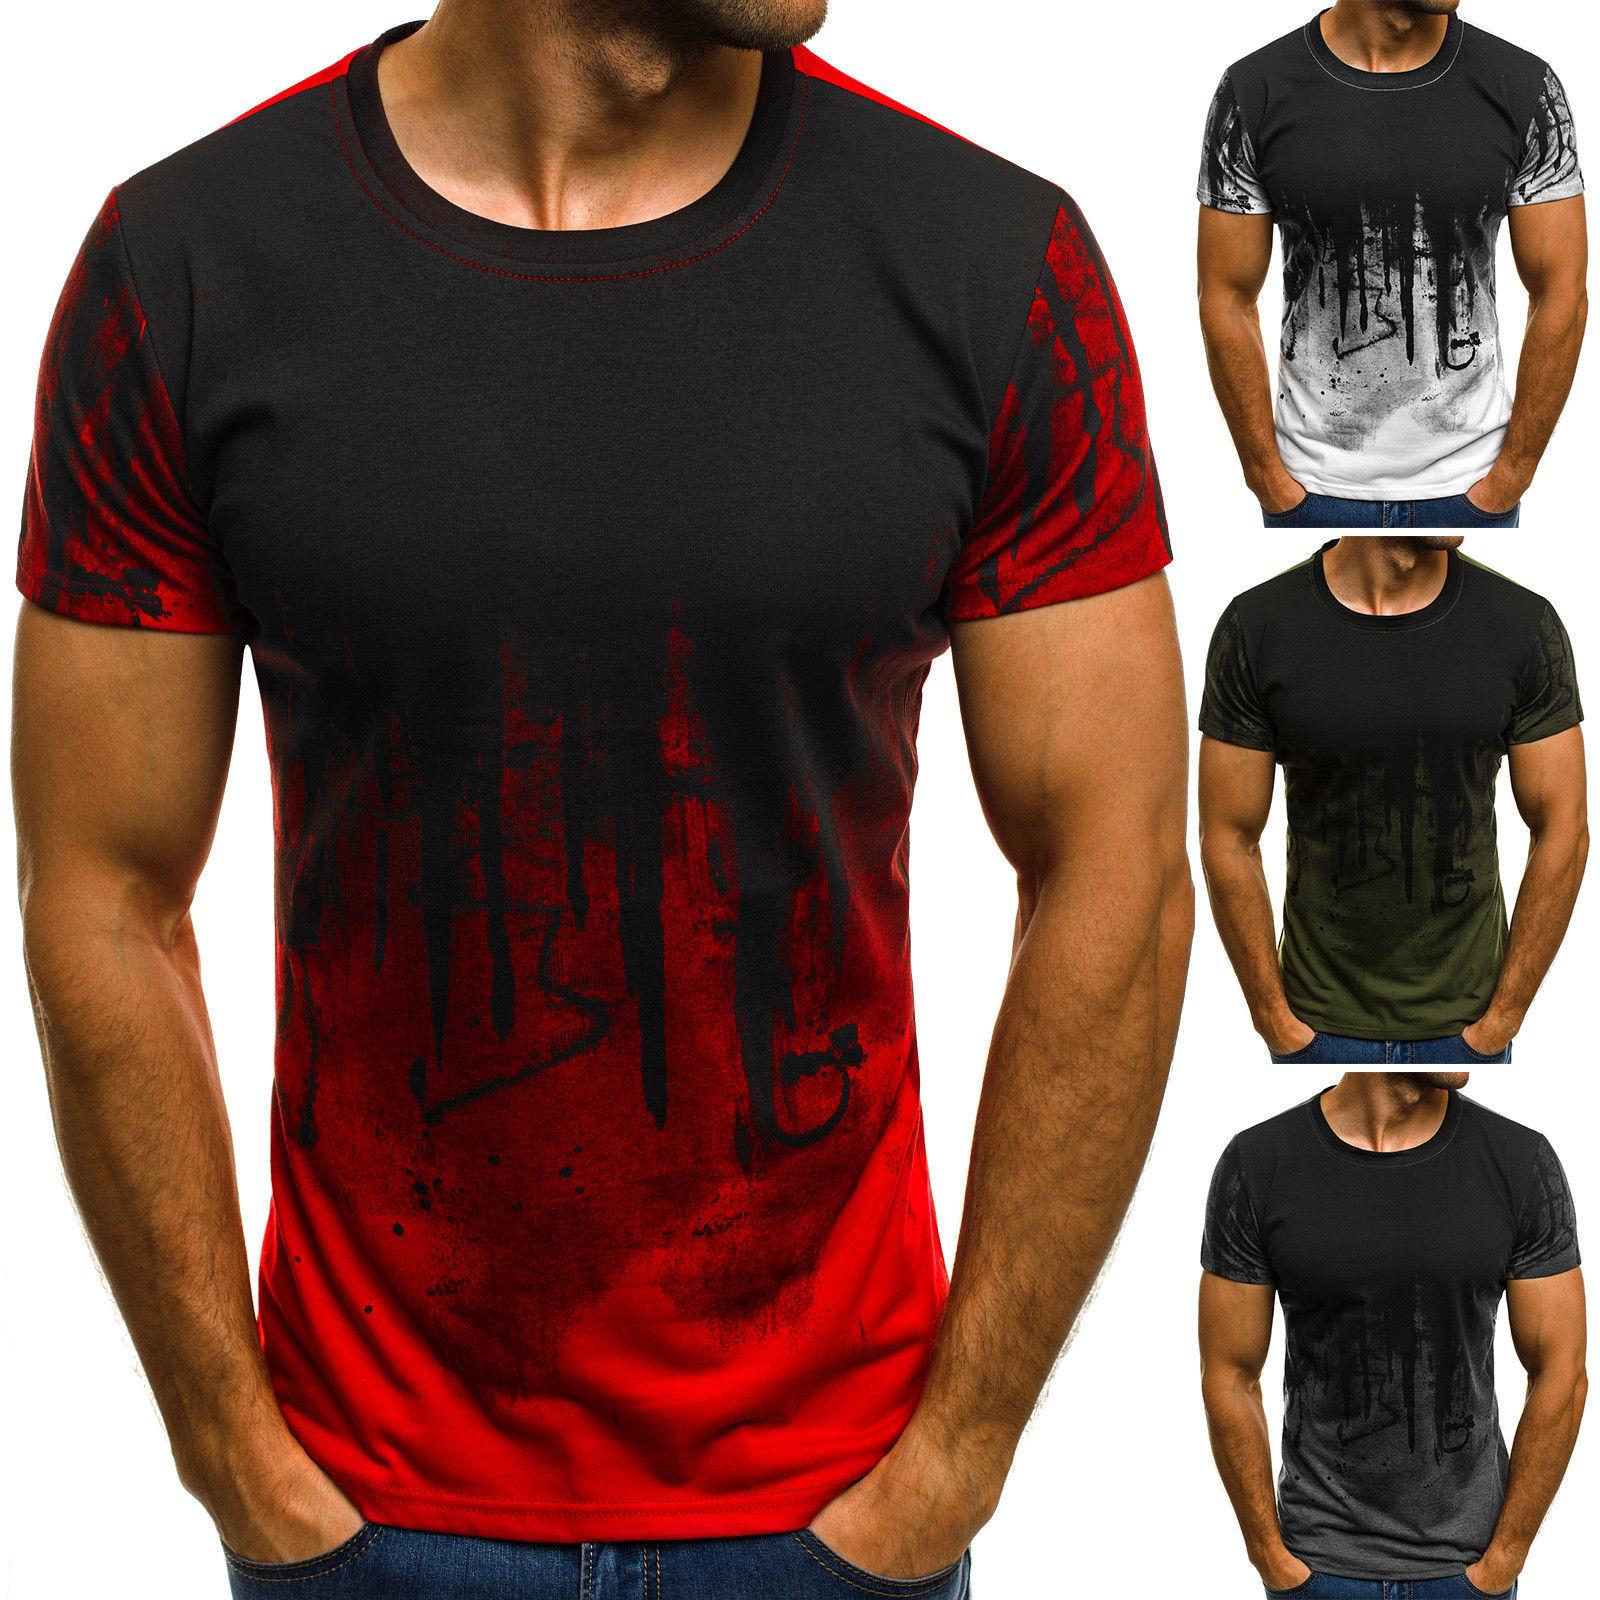 E-BAIHUI Men Fitness Compression T-Shirt Casual Cotton Black And Red Gradient High Quality Slim Shirt Men Fashion Tee Tops CG002